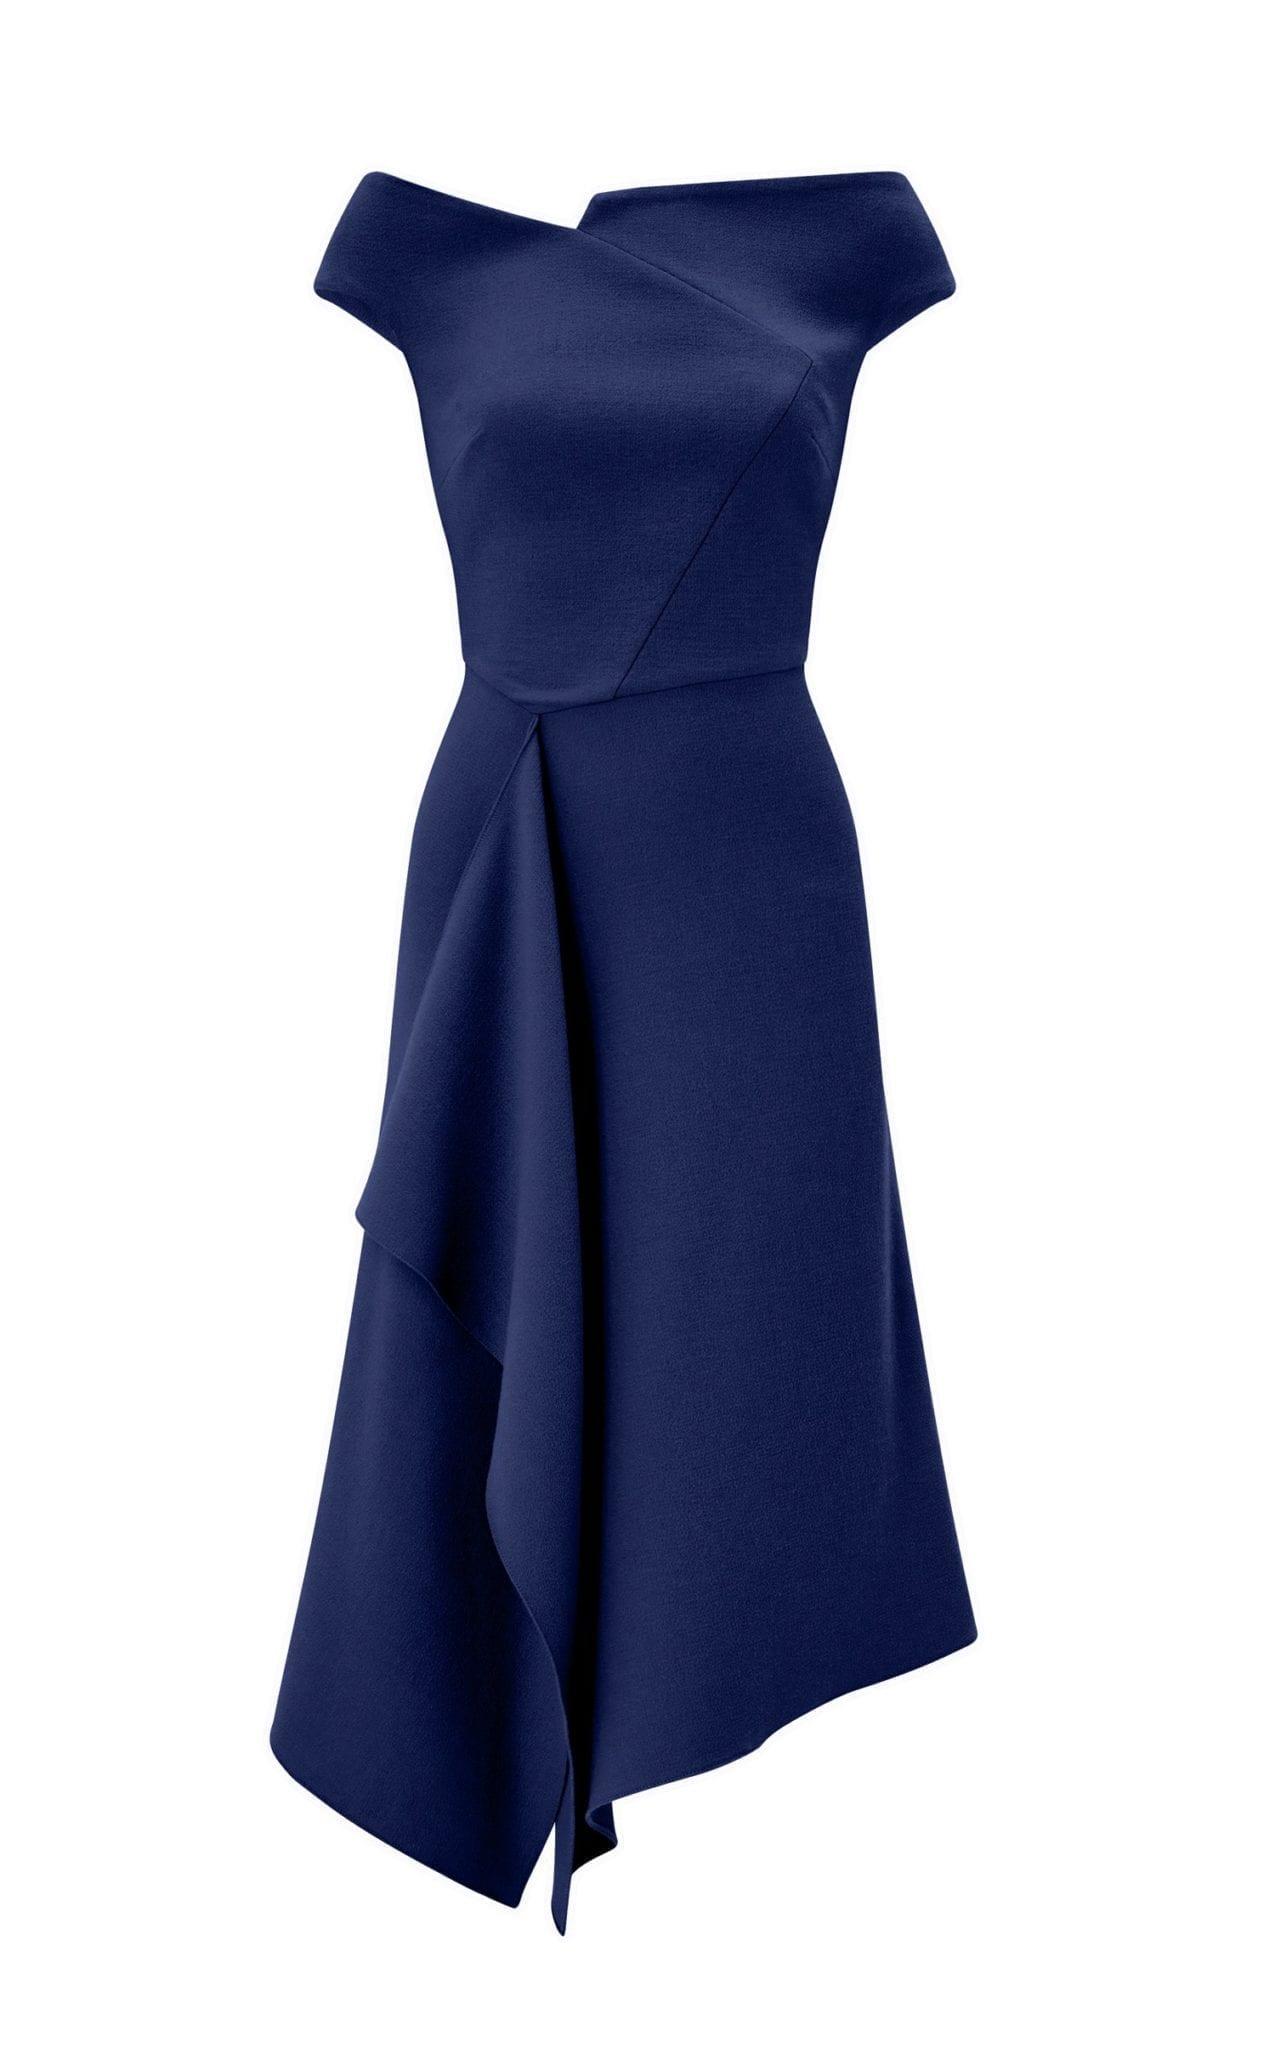 ROLAND MOURET Barwick Navy Dress 5